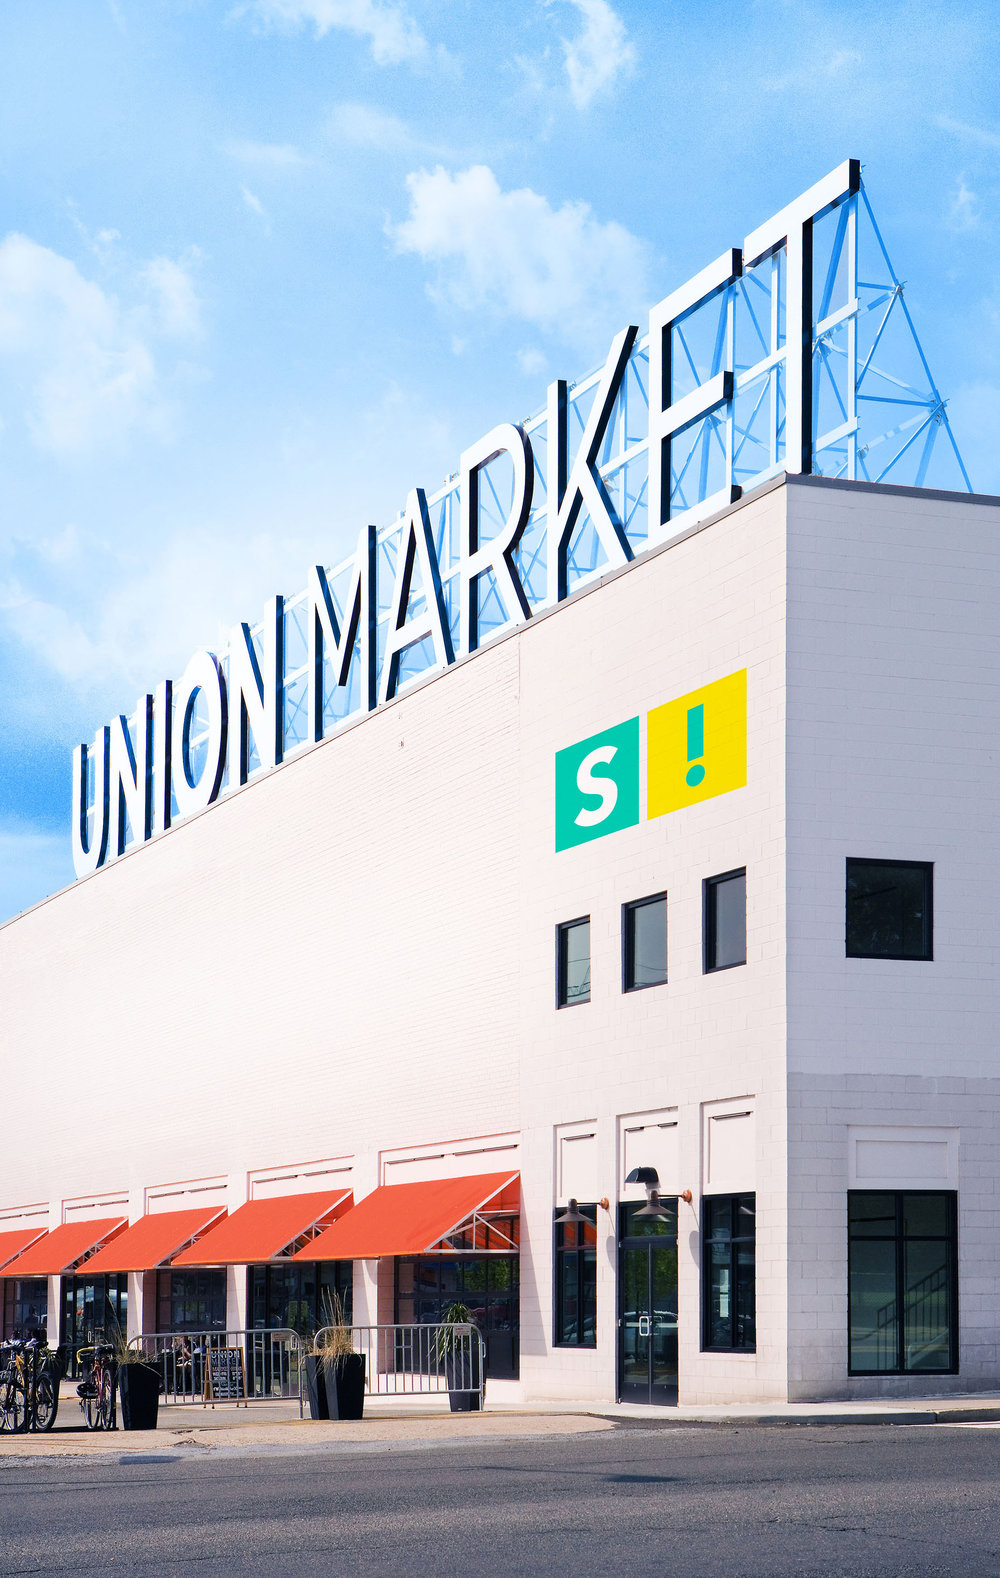 Union Market with Superfine! Logo - small.jpg